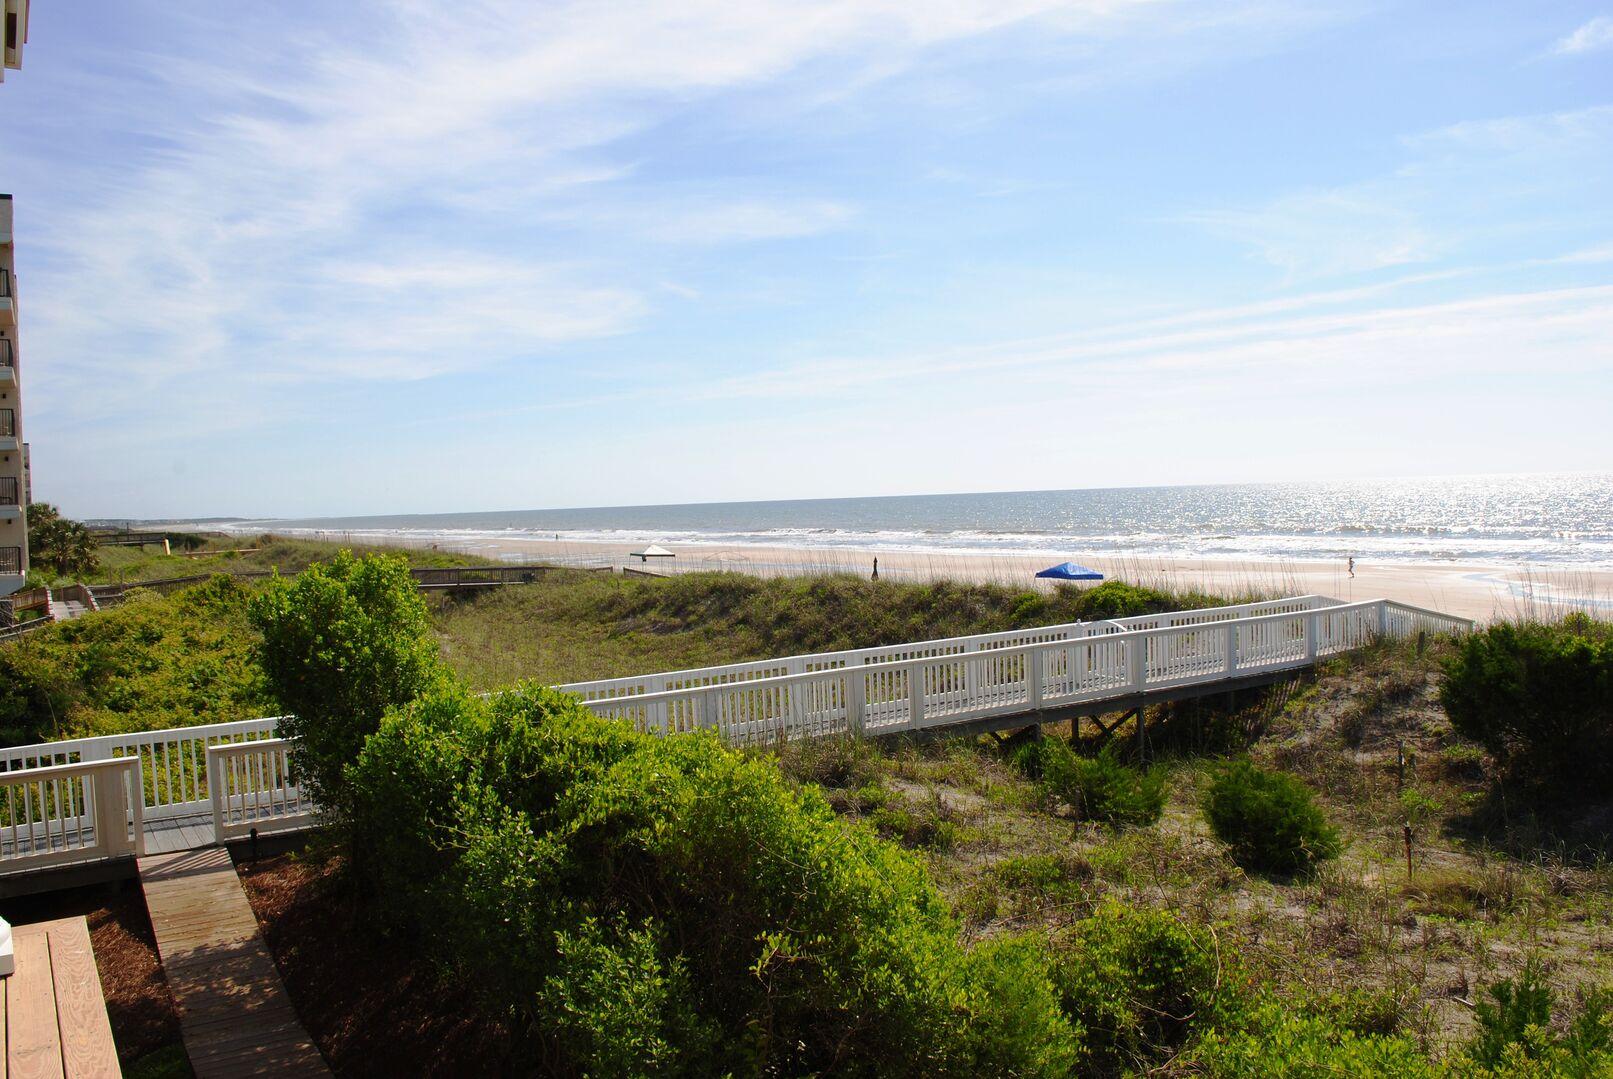 Walkway to the Beach